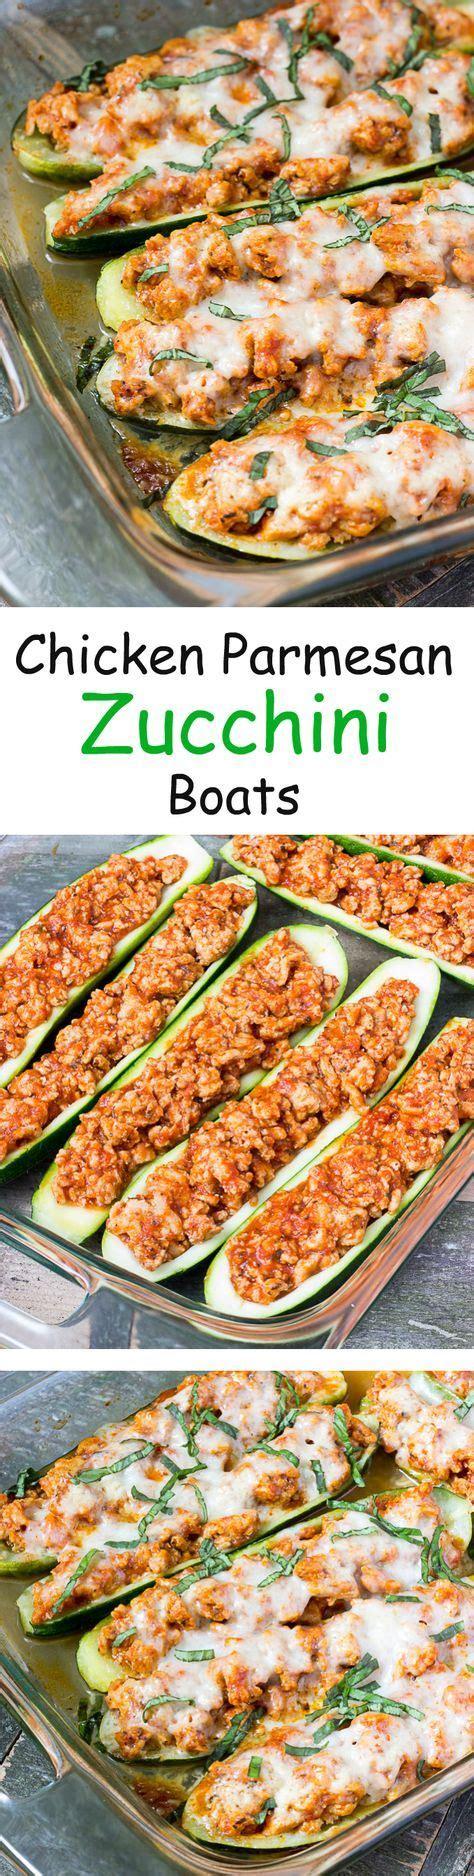 dinner on the boat recipes 100 zucchini boat recipes on pinterest stuffed zucchini